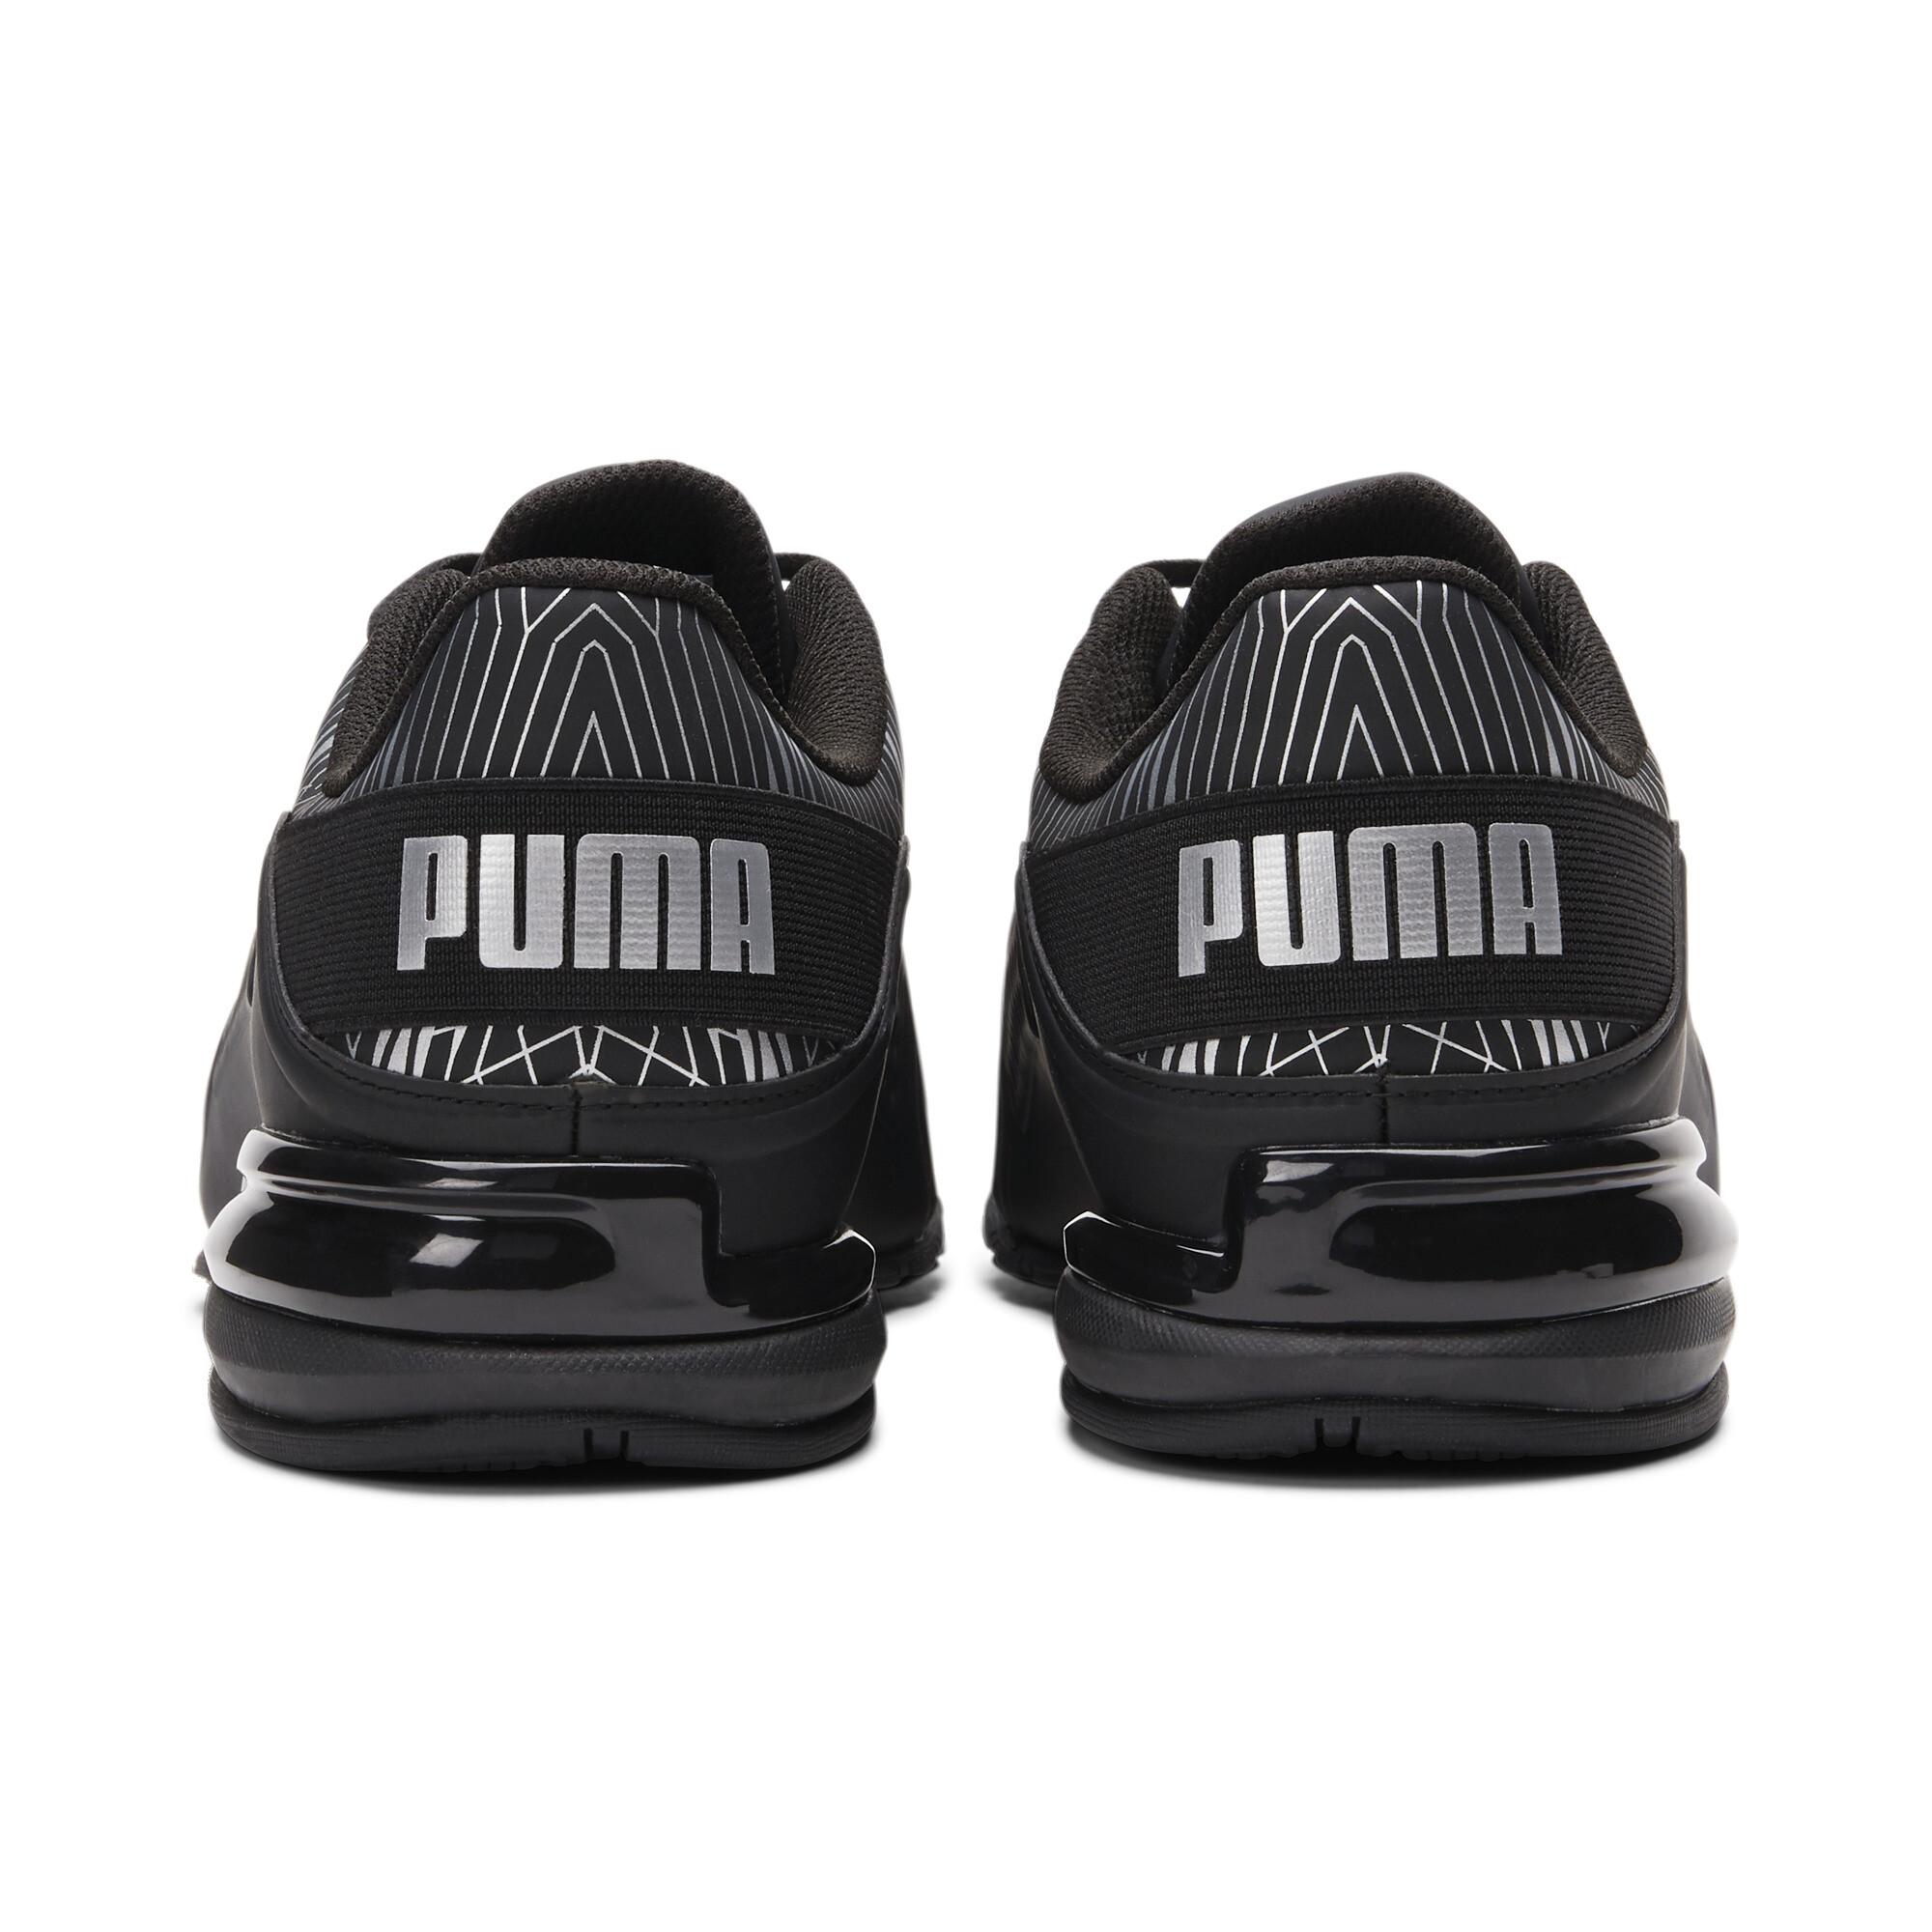 thumbnail 14 - PUMA Men's Viz Runner Graphic Sneakers